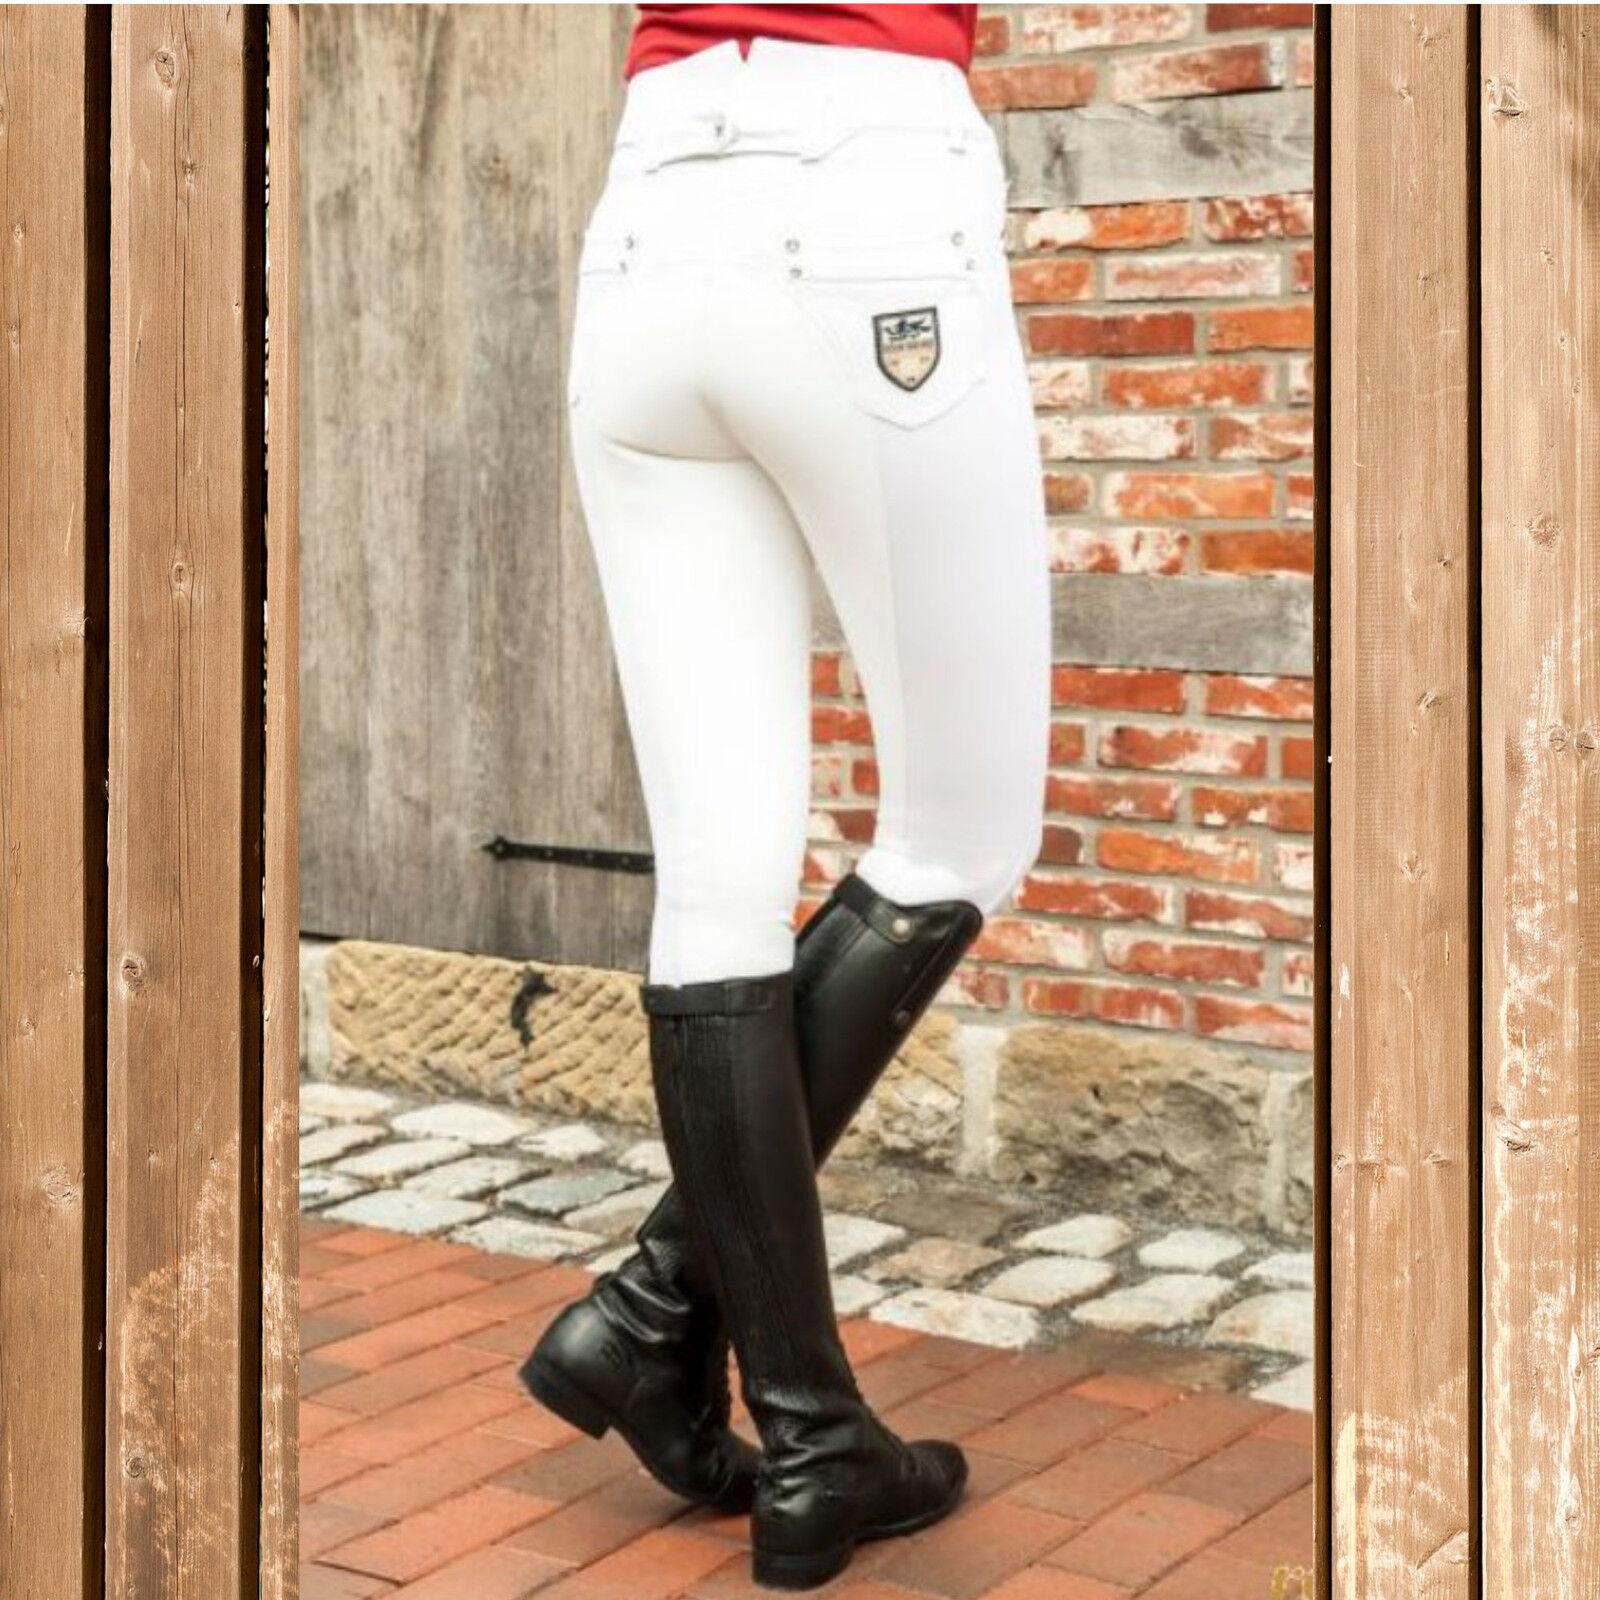 HKM jodhpurs, TournaSiet Jodhpurs Stiefel Riding Hose Miss Blink, High waist, Weiß